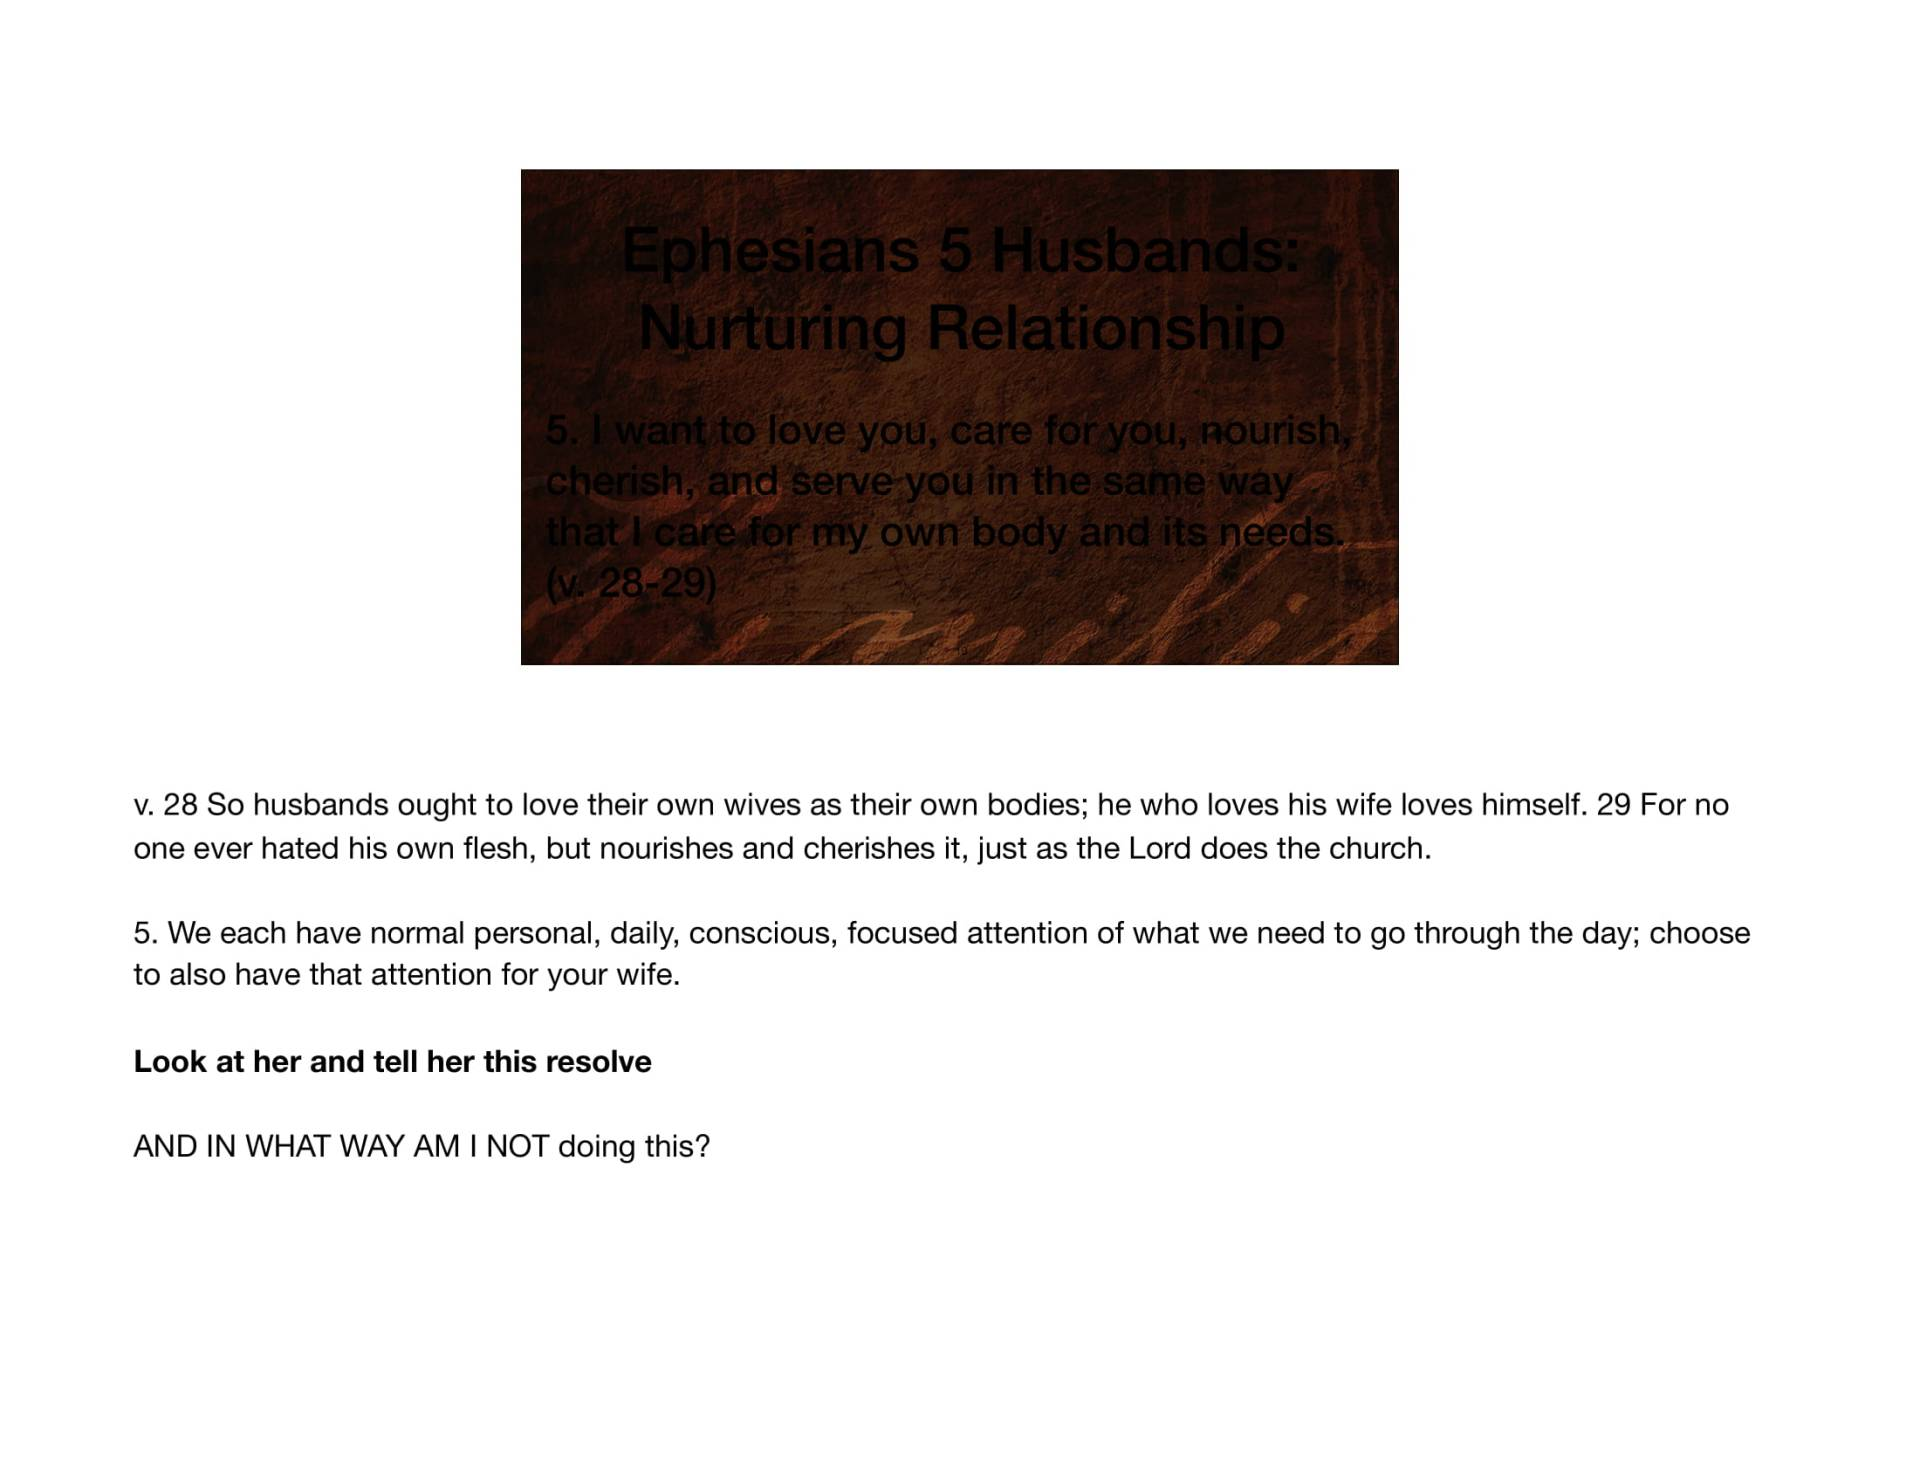 LGI-04 - Caution Men - Spiritual Maturity Is Not Automatic-19